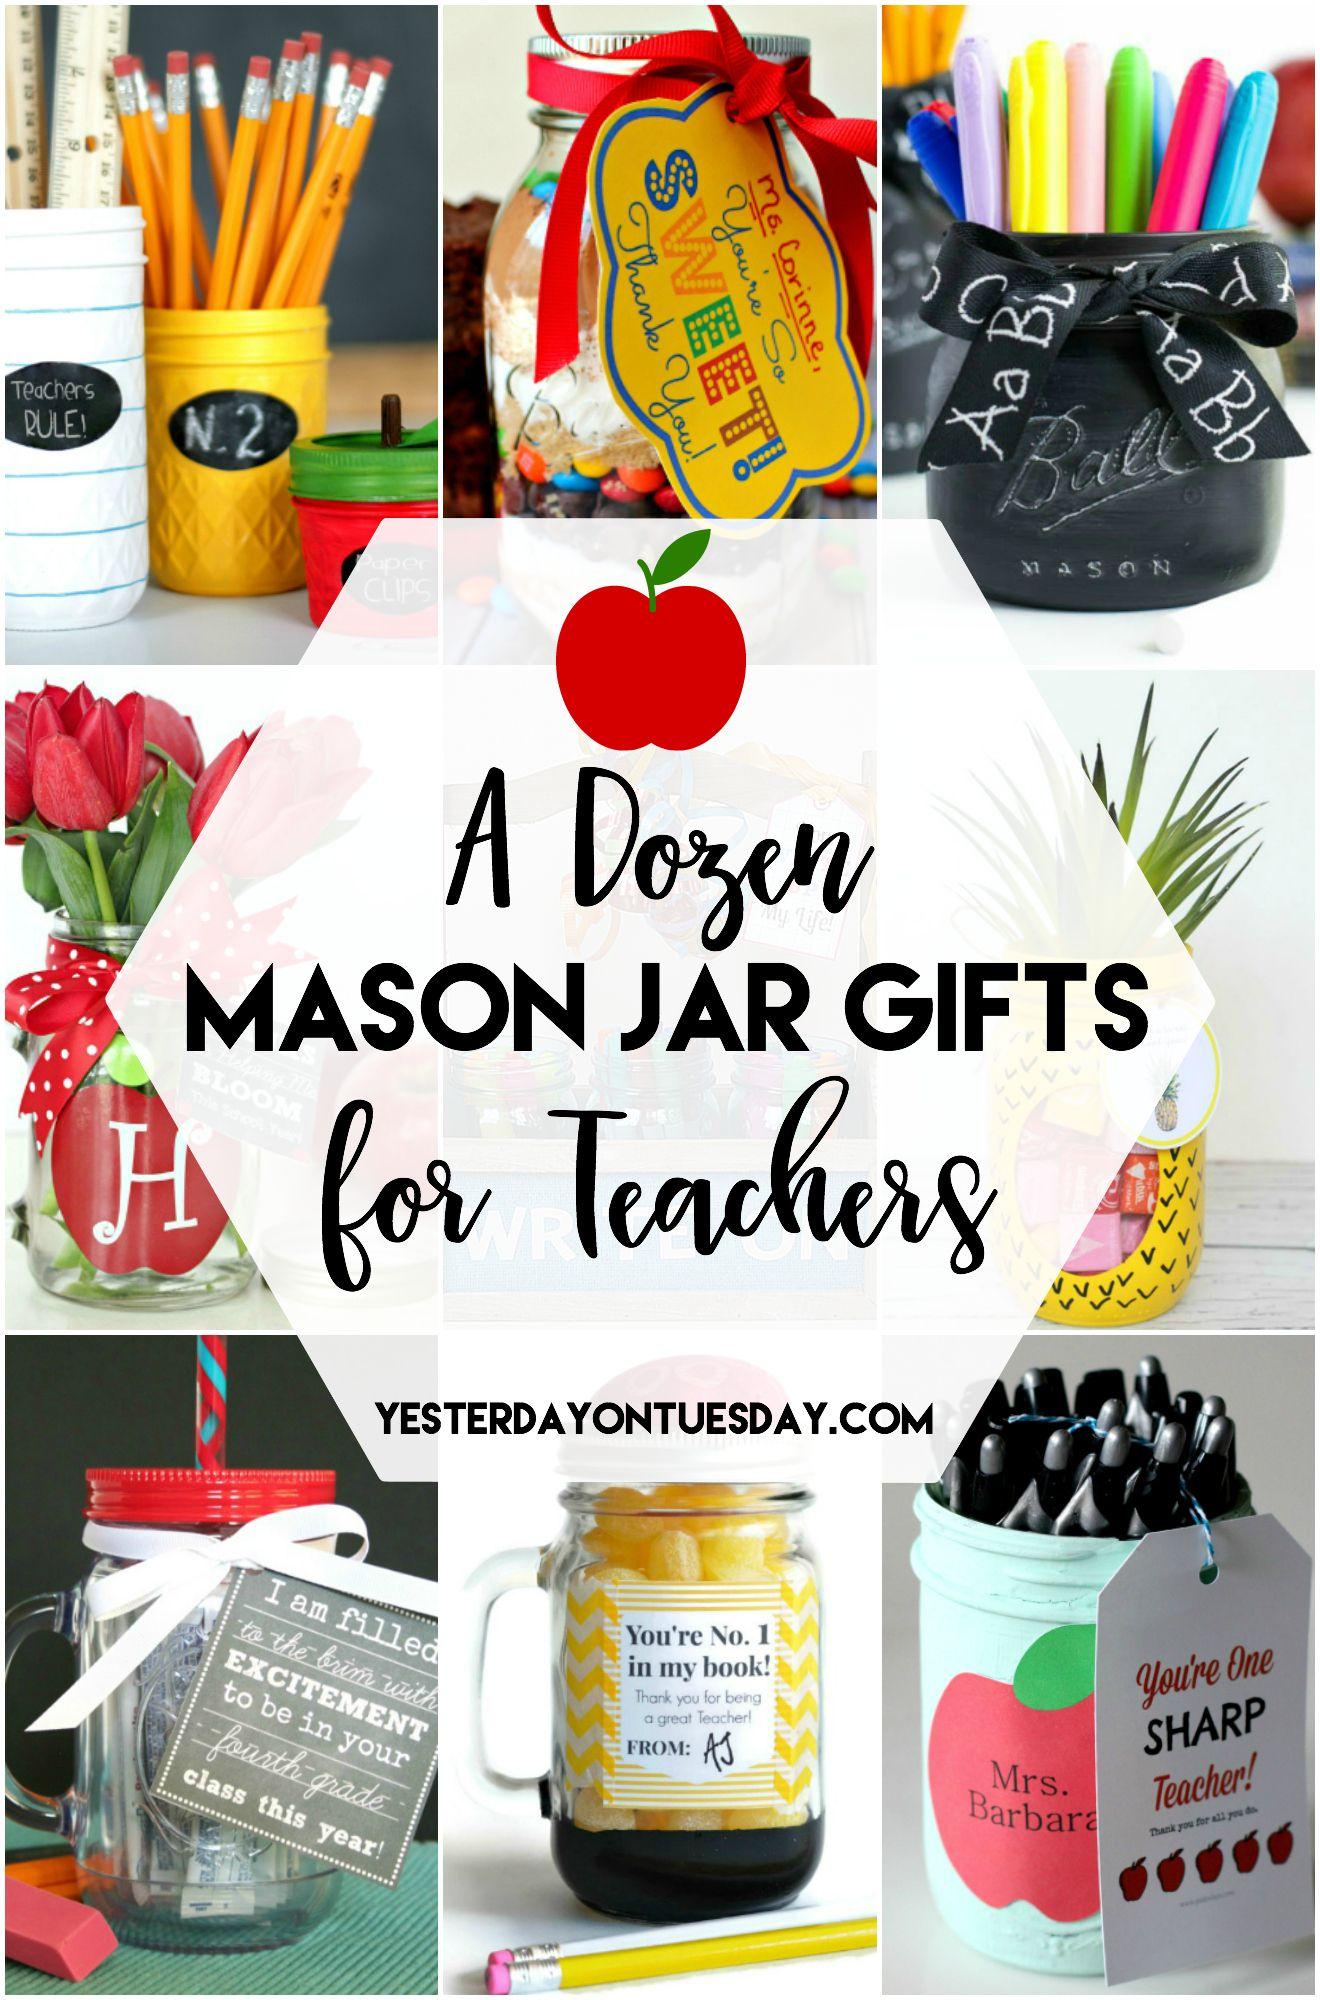 A Dozen Mason Jar Gifts for Teachers Great ideas to make